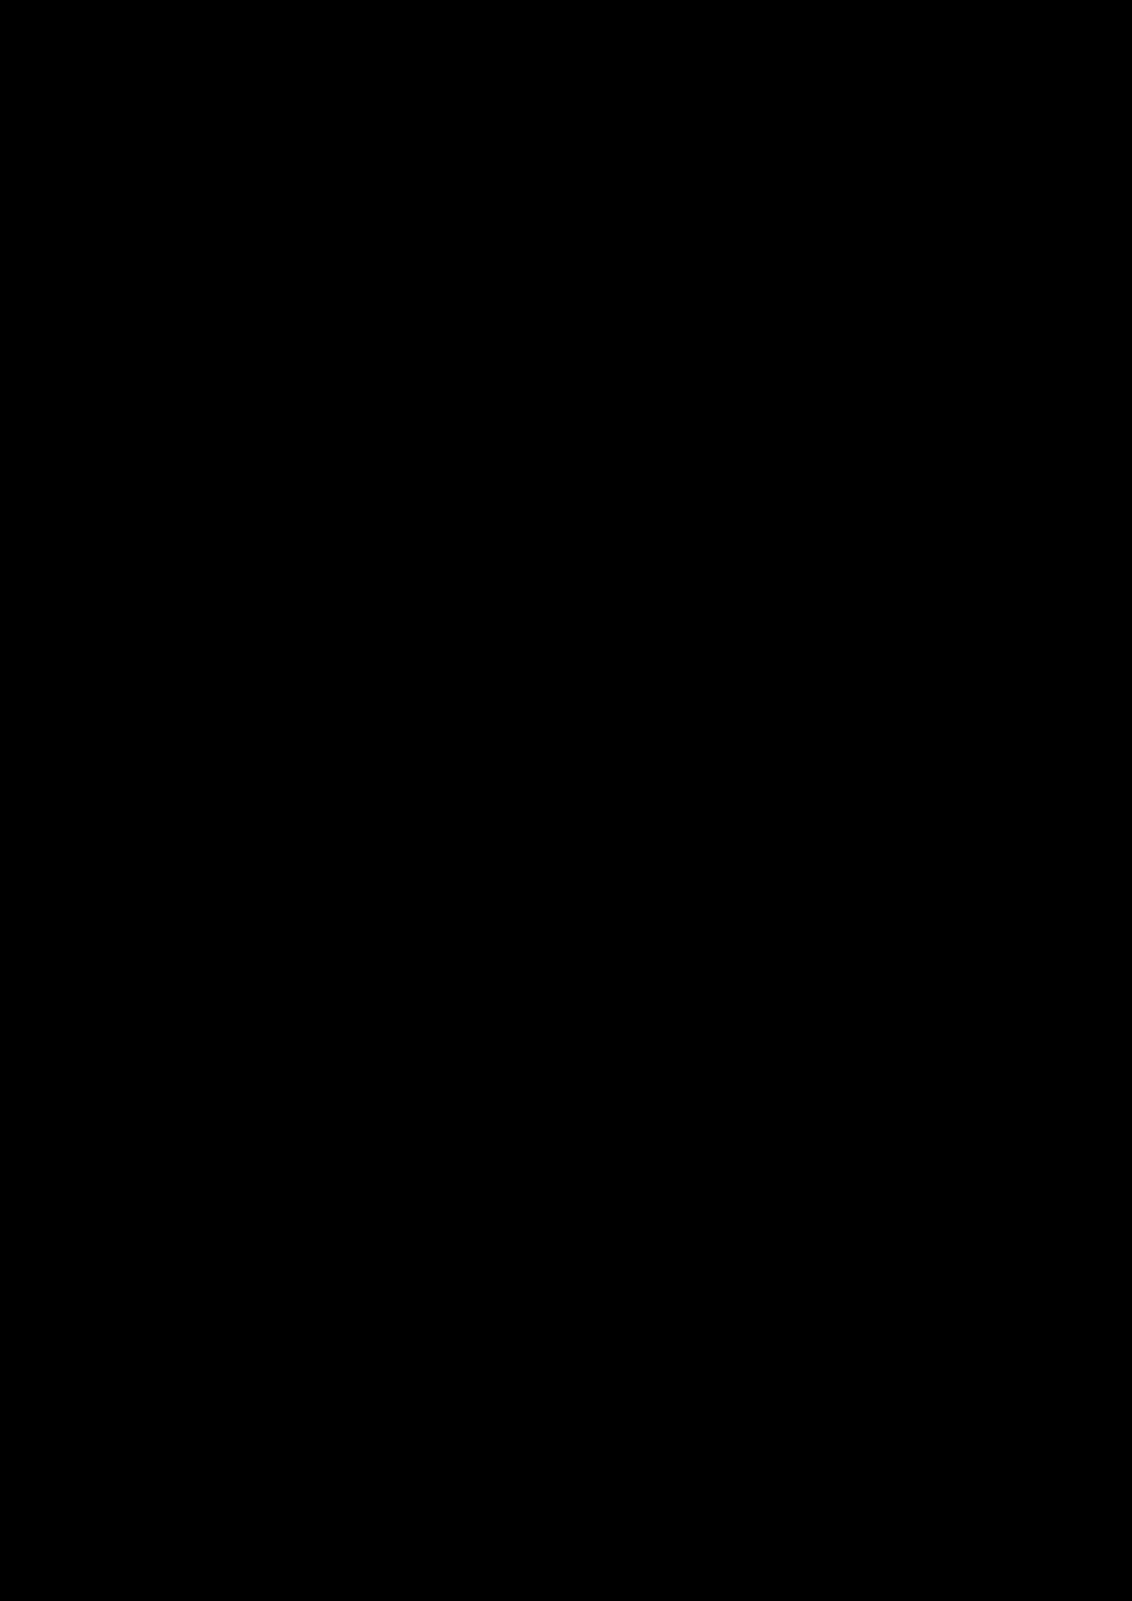 Ten lyubvi slide, Image 7